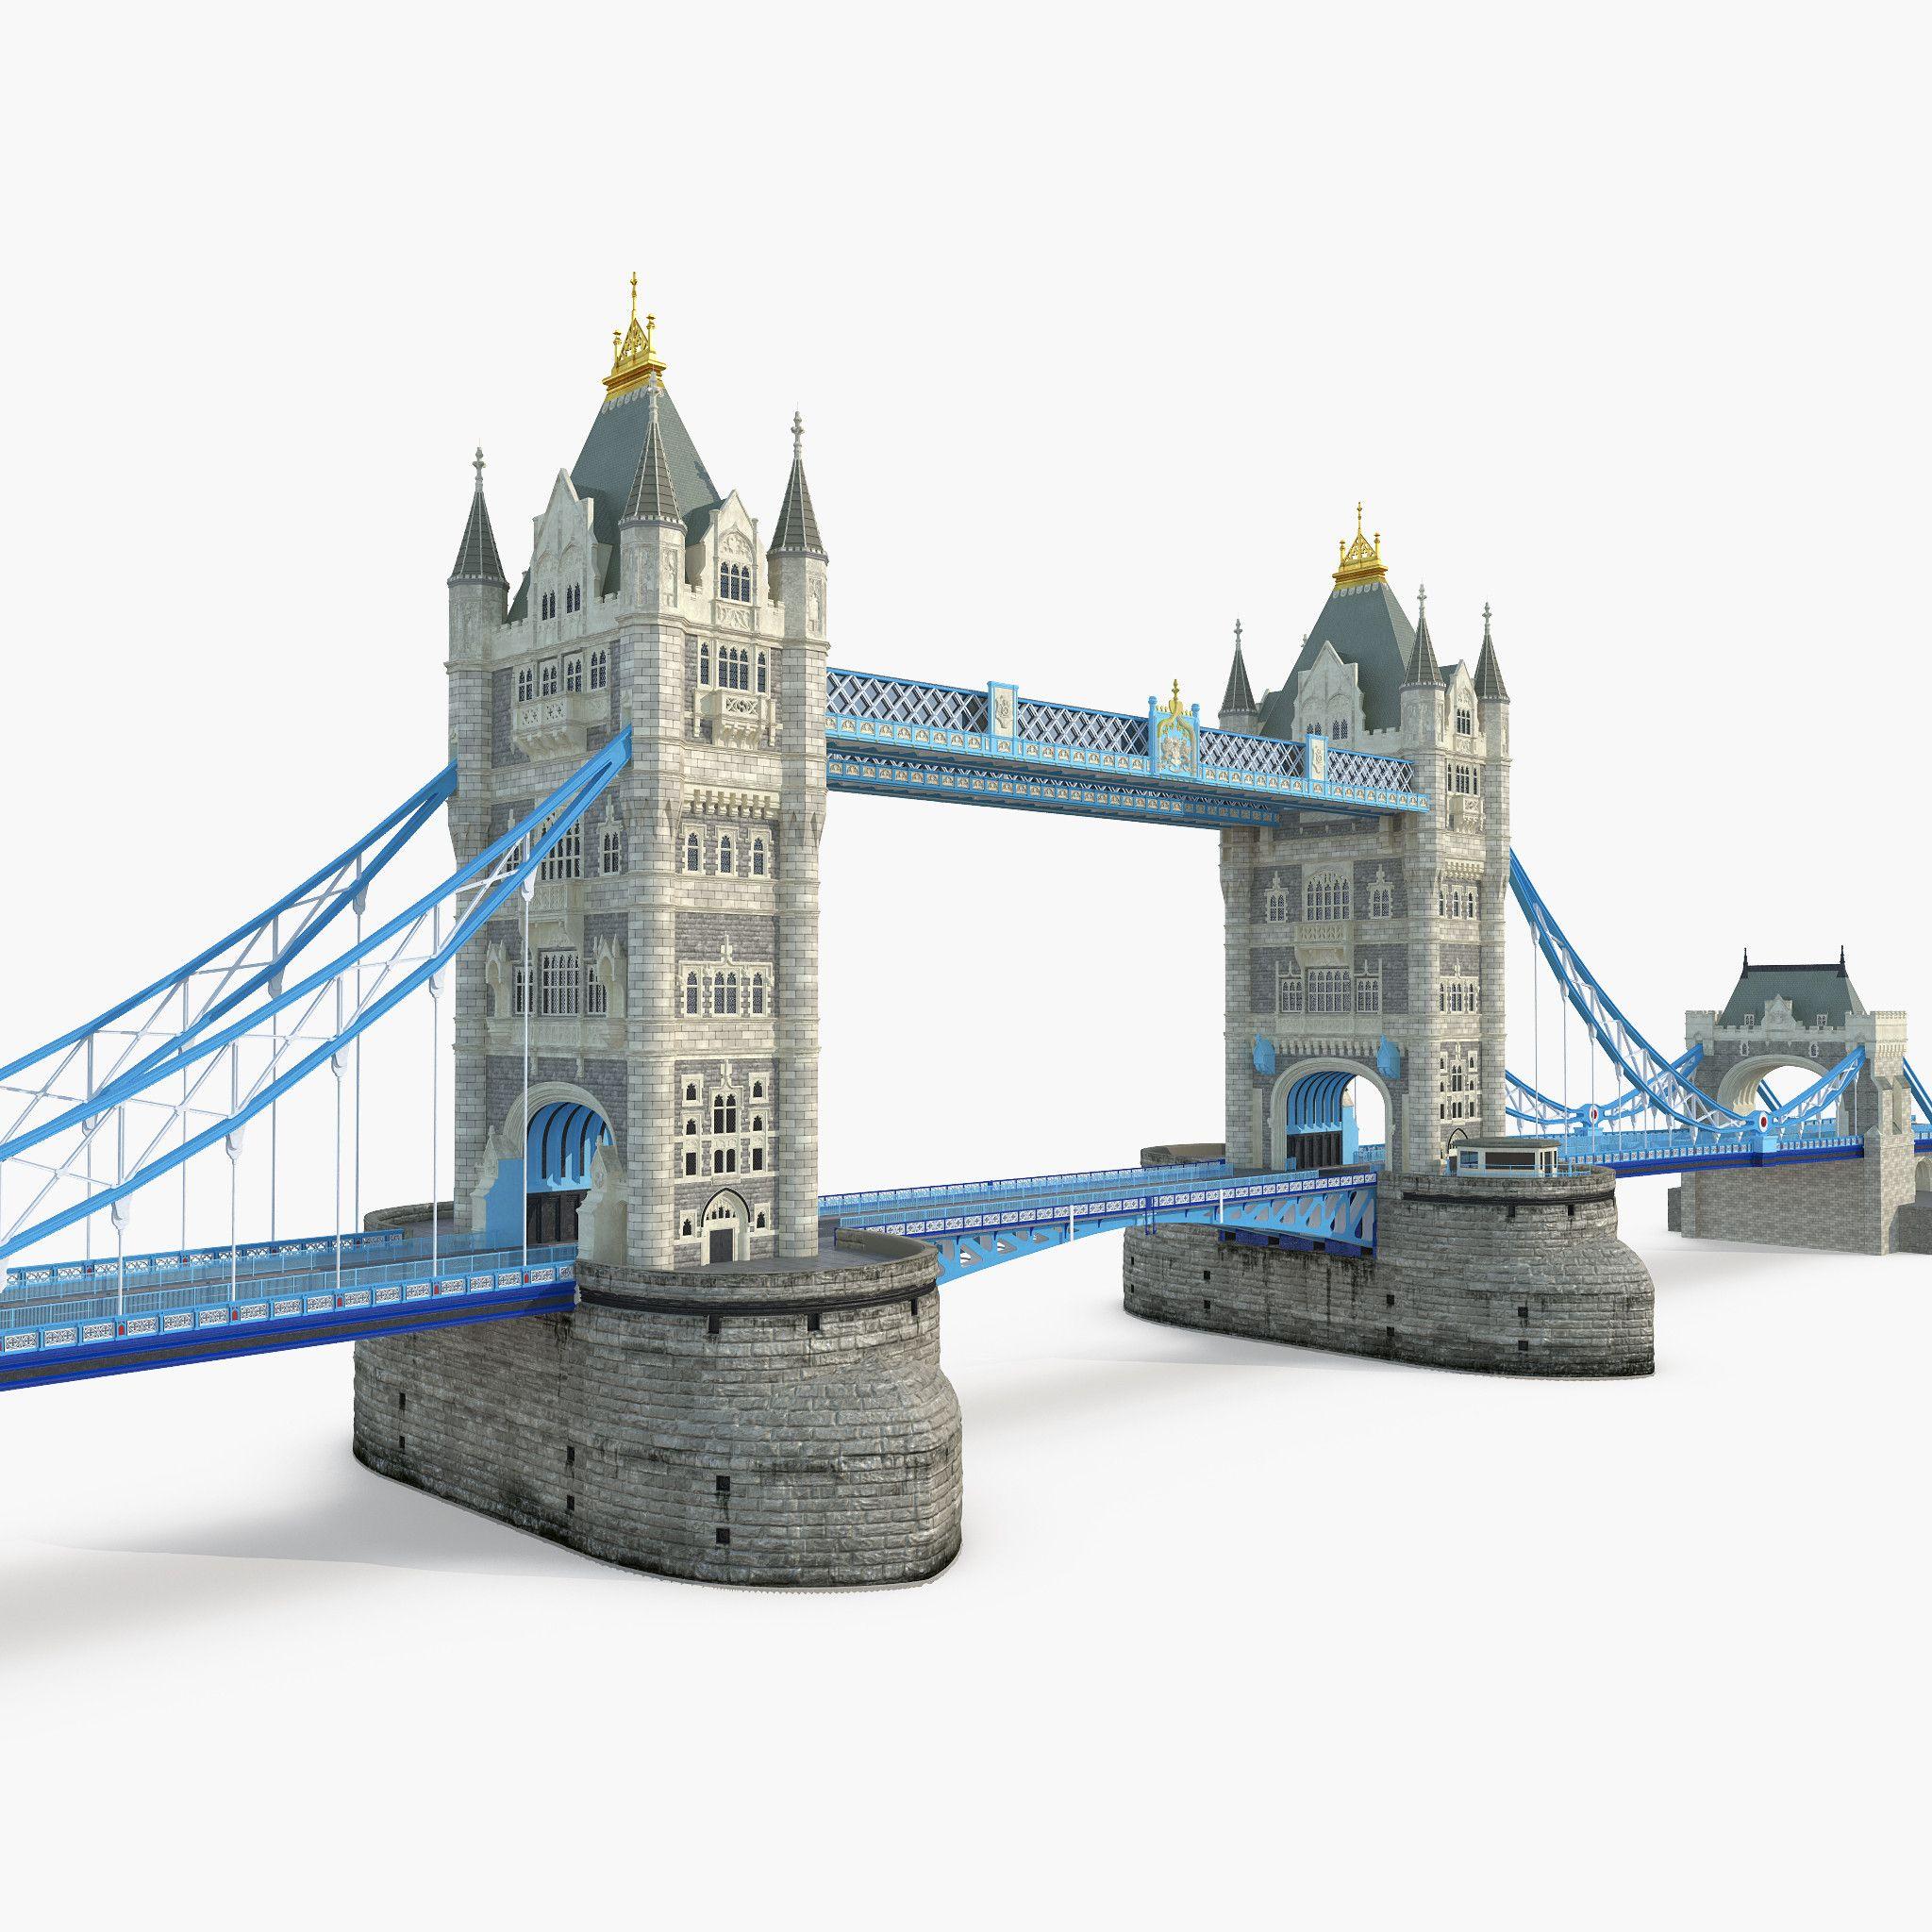 Olympic Memorabilia Olympic Pins 2012 London England Uk London Bridge Big Ben Cut Out London 2012